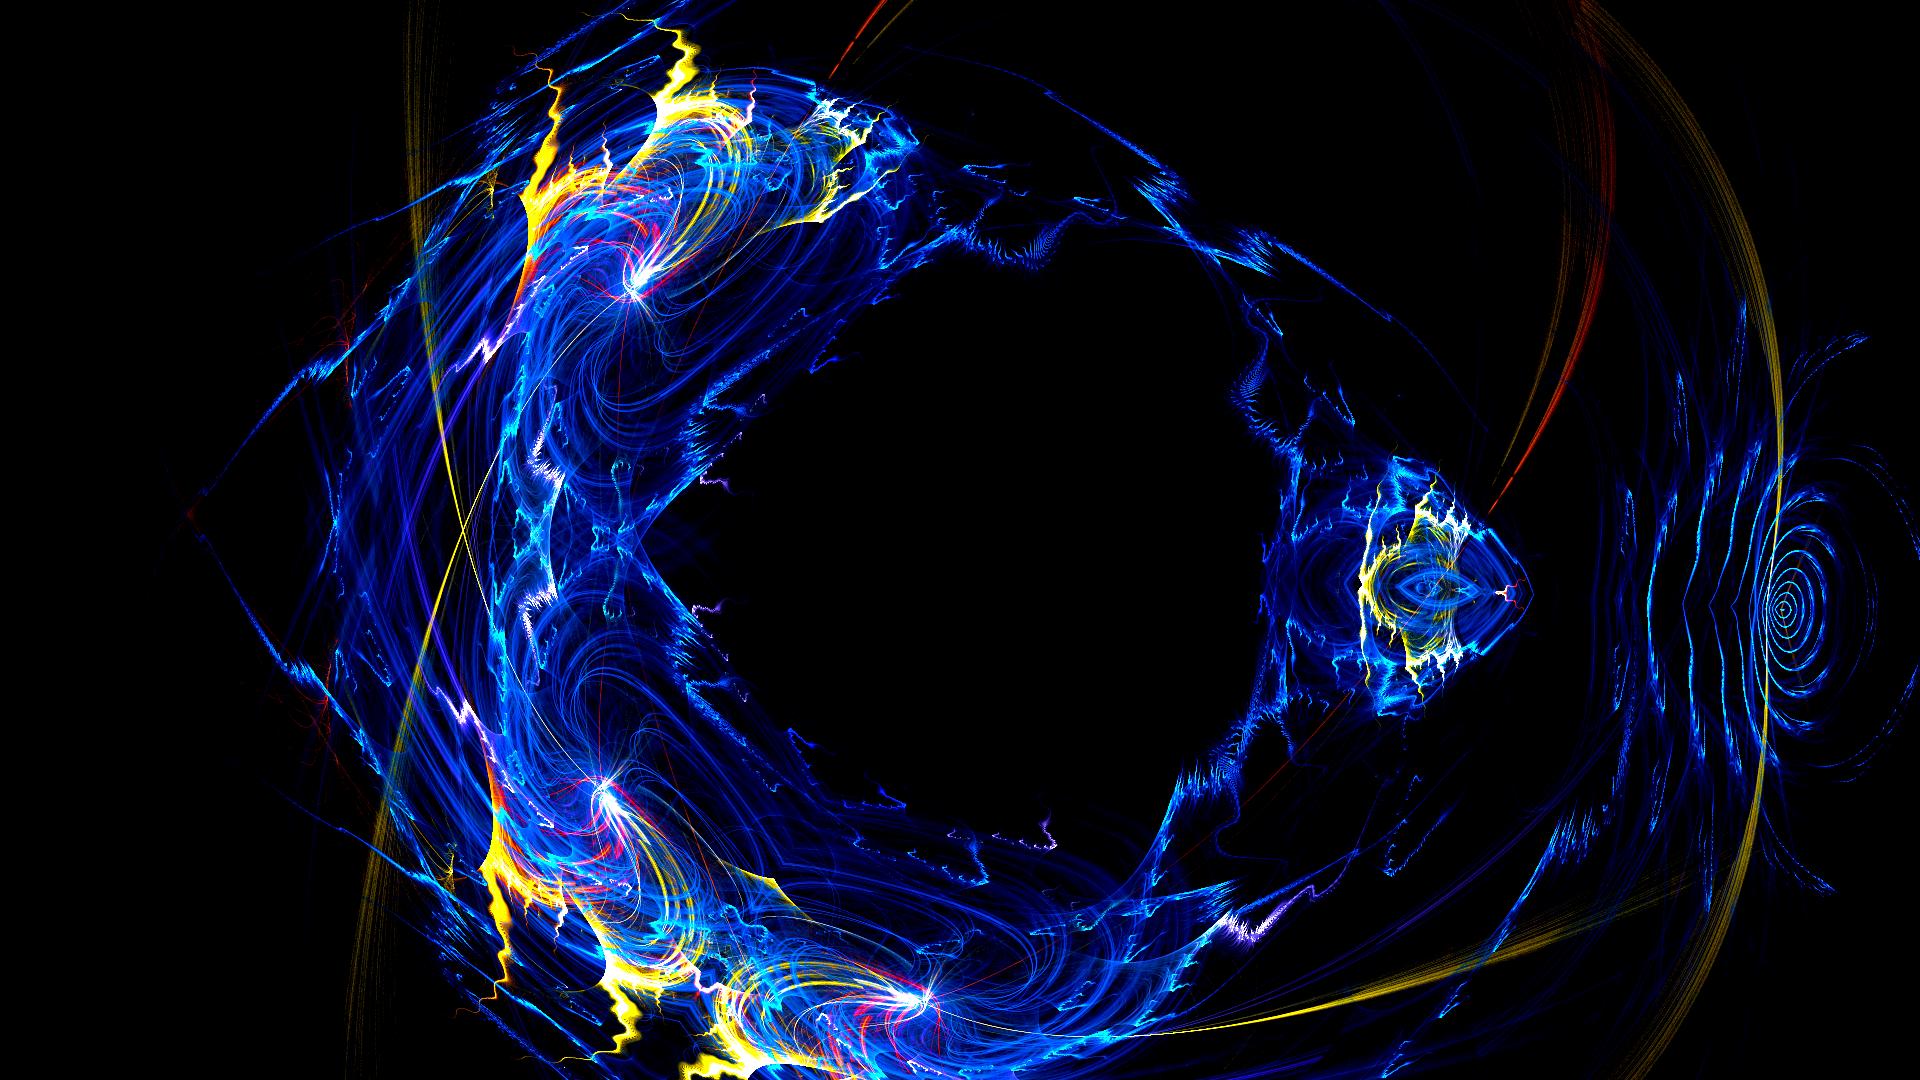 Mandelbrot Energy by Fractamonium